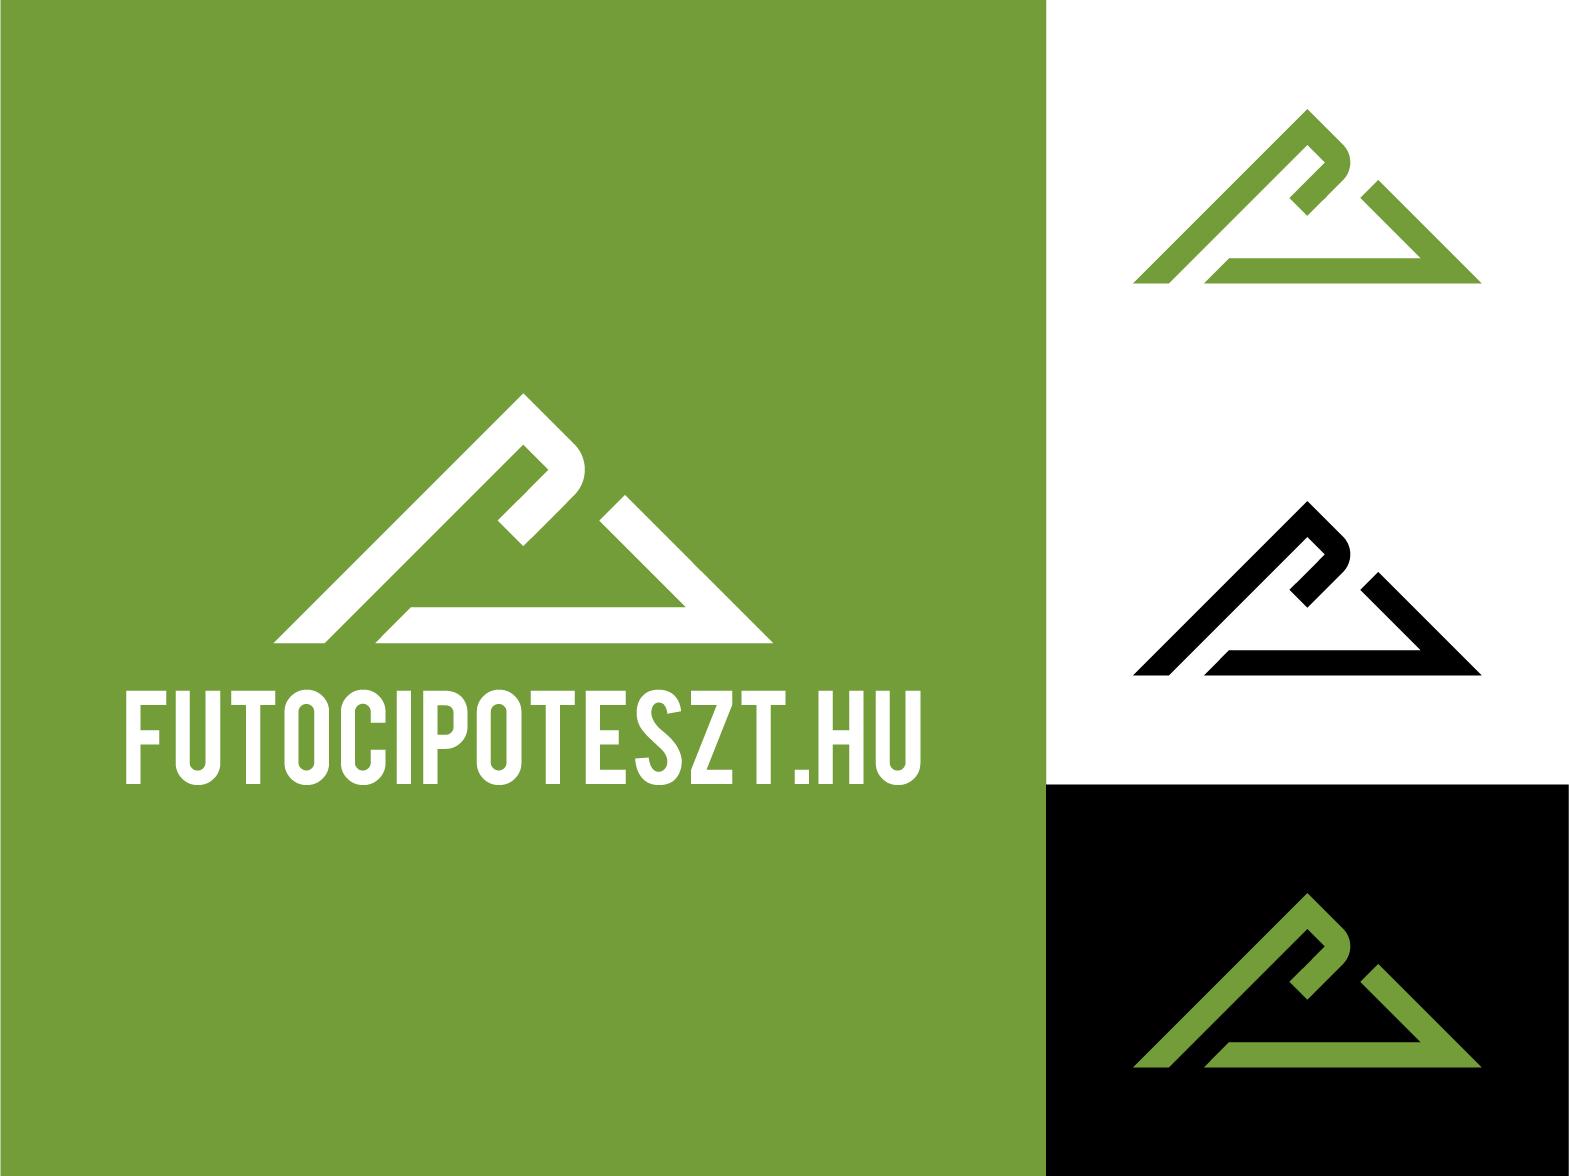 futocipoteszt.hu logo webshop test shoes boots running run motivation design modern logo design graphic  design icon branding vector logo